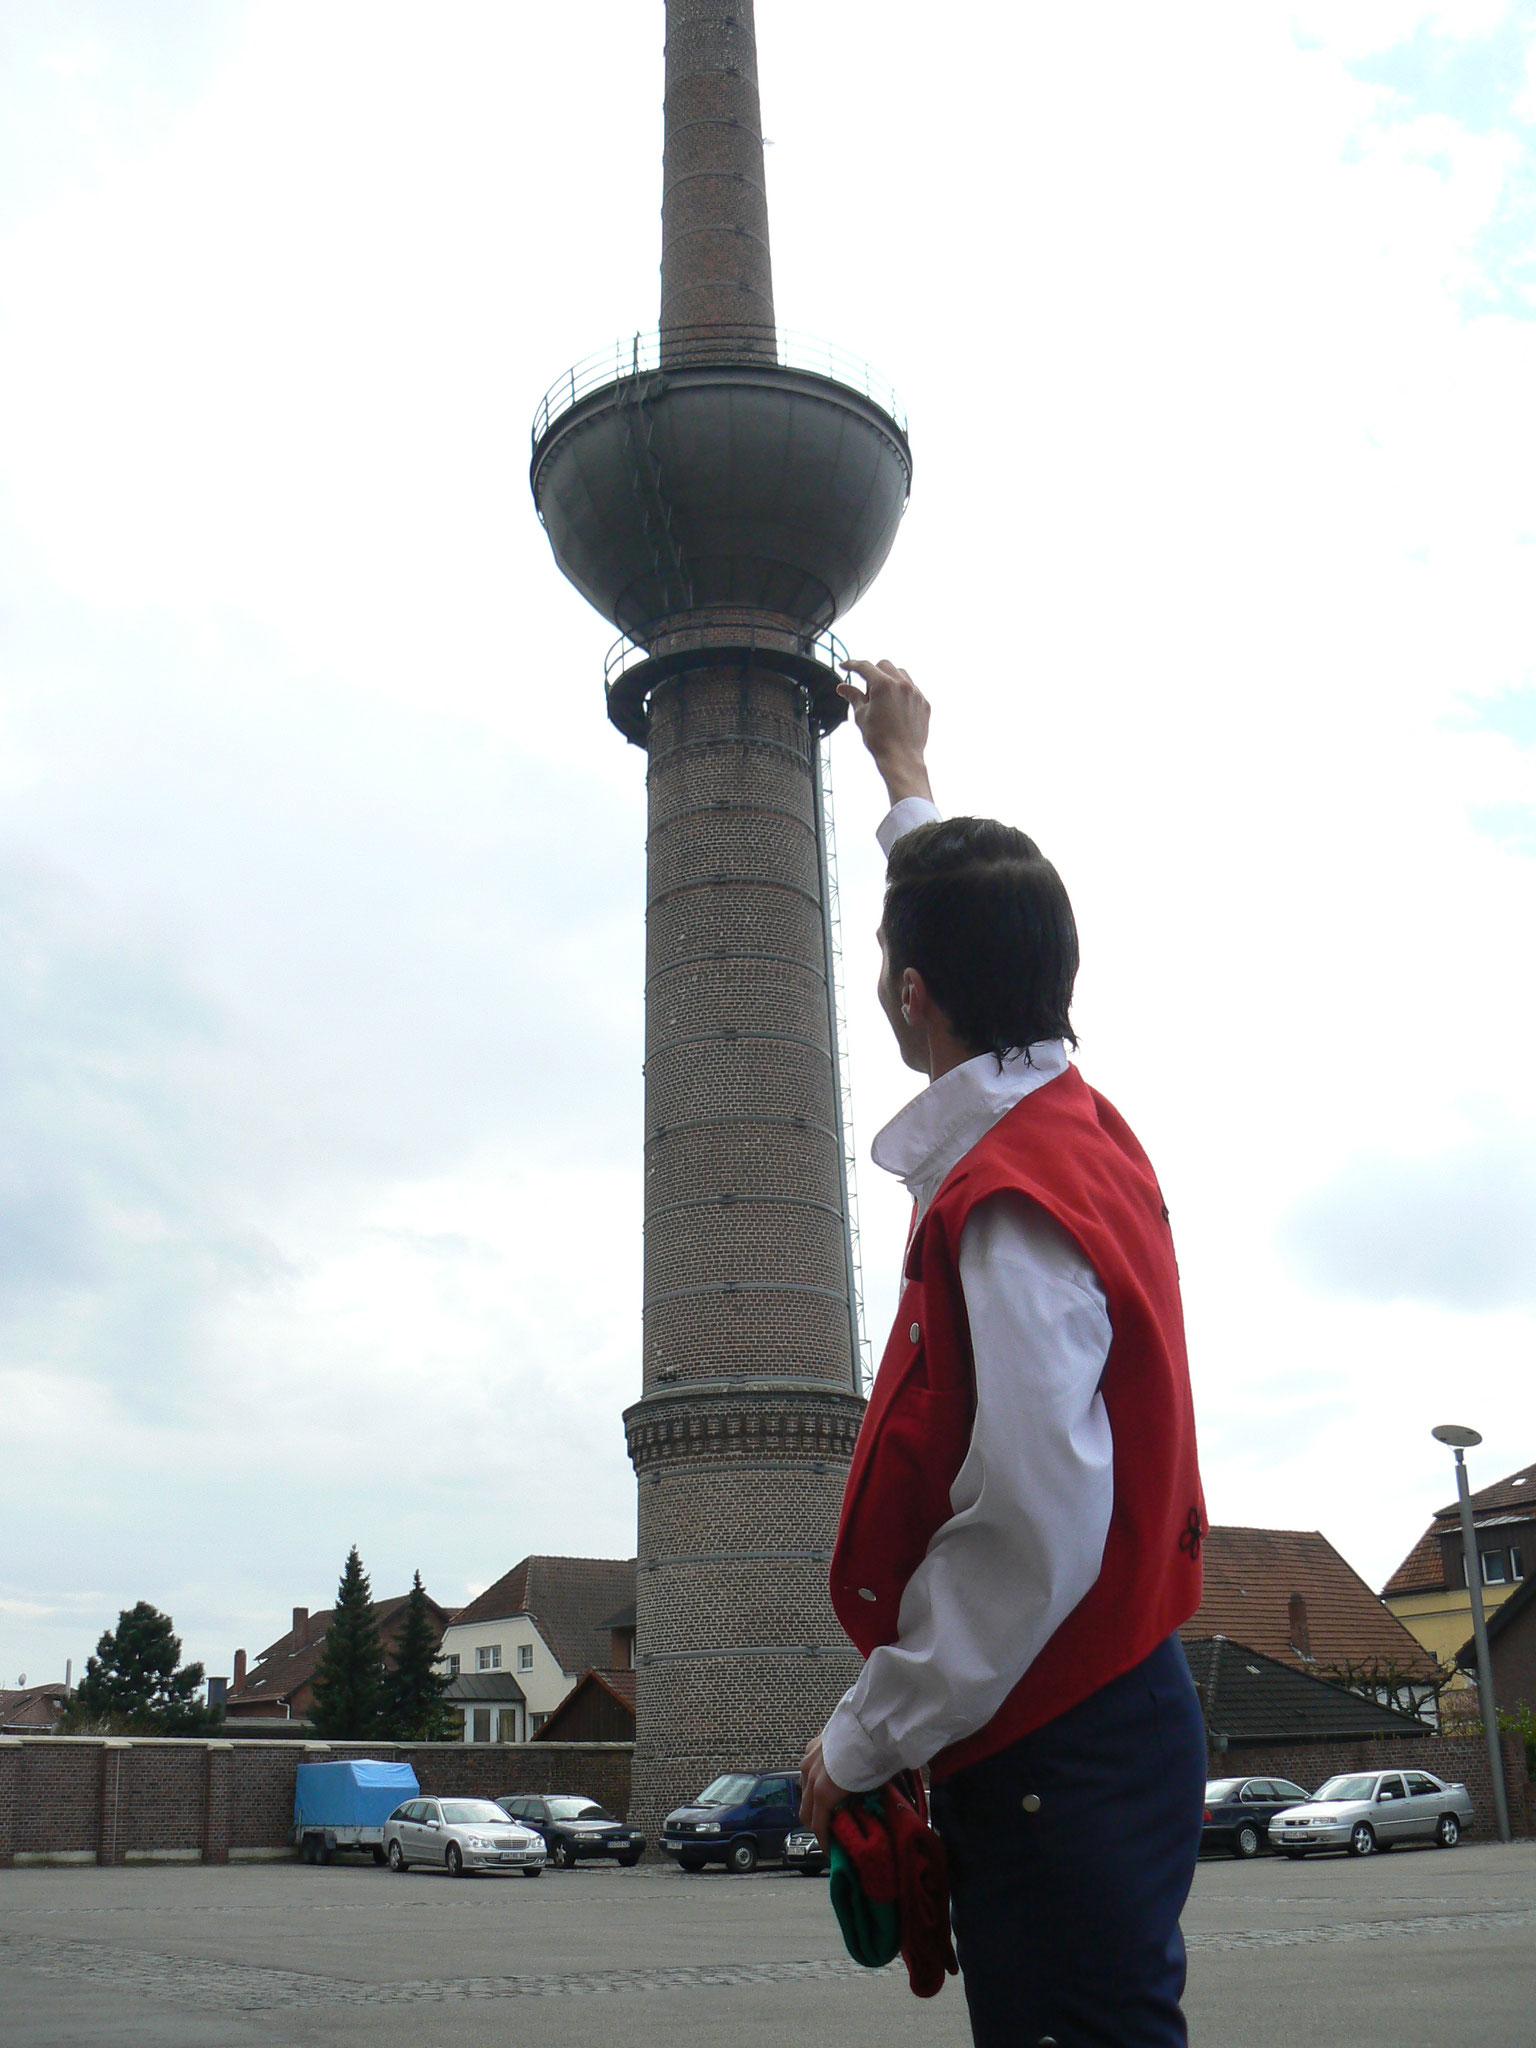 GEMPT-Halle in Lengerich - 2008